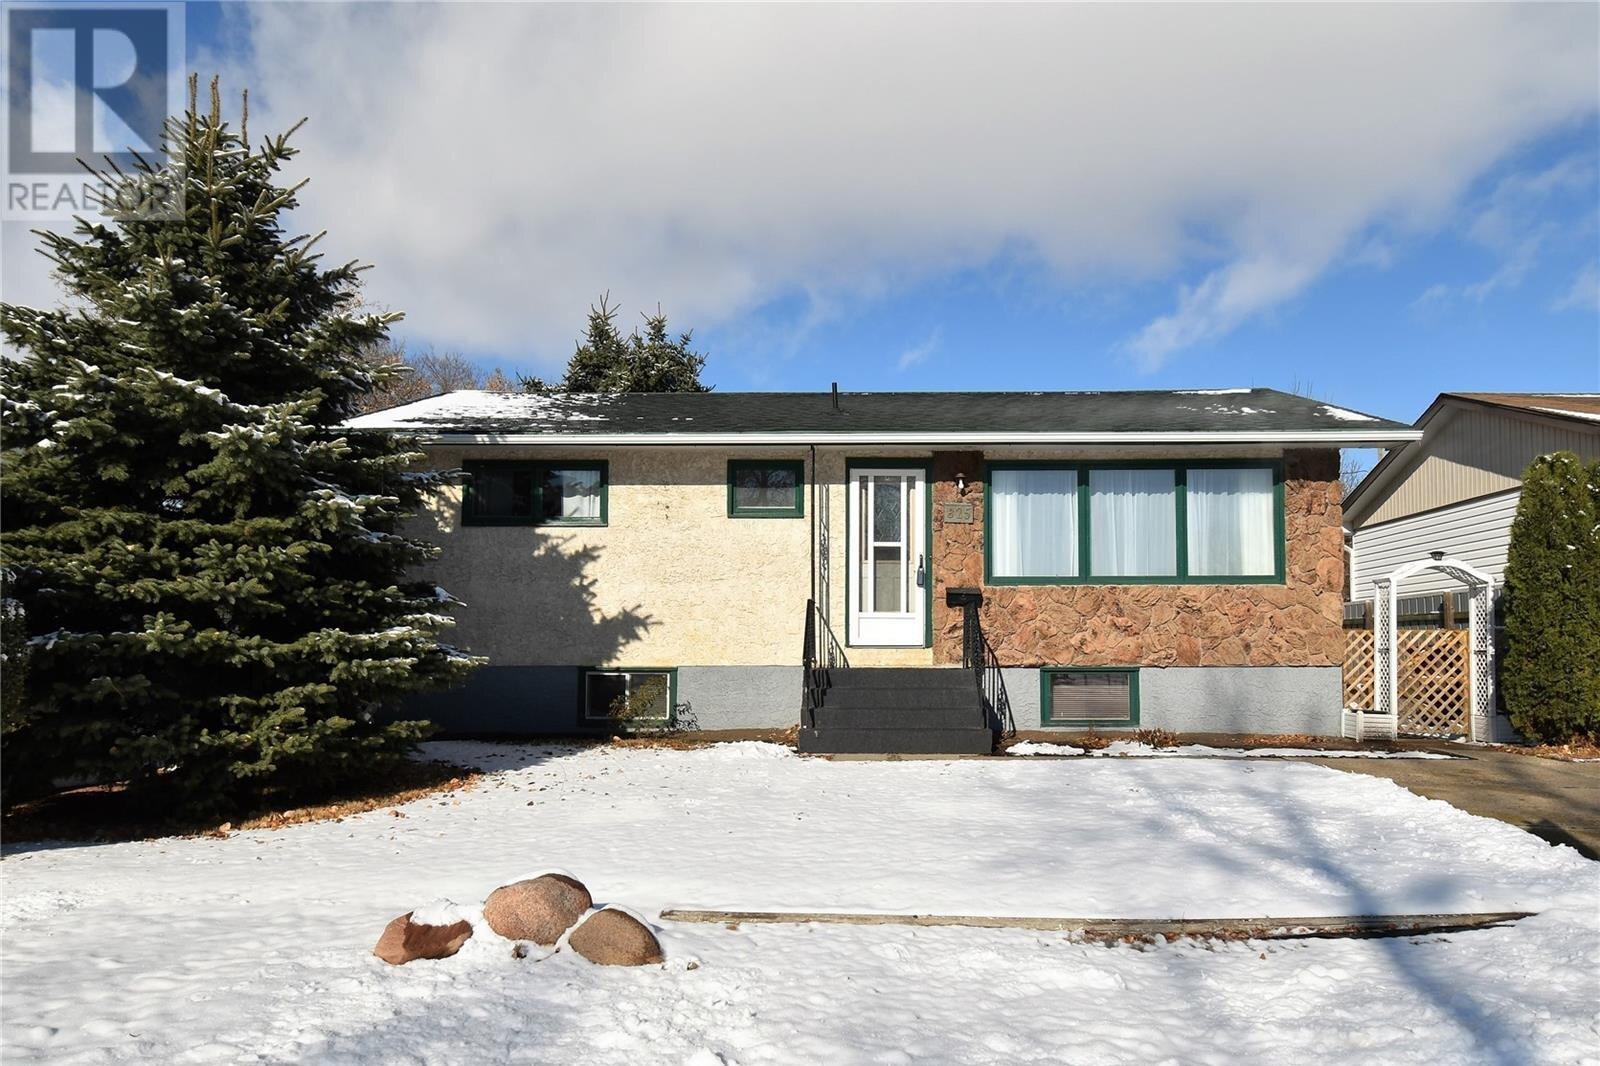 House for sale at 825 Henry St Estevan Saskatchewan - MLS: SK831292